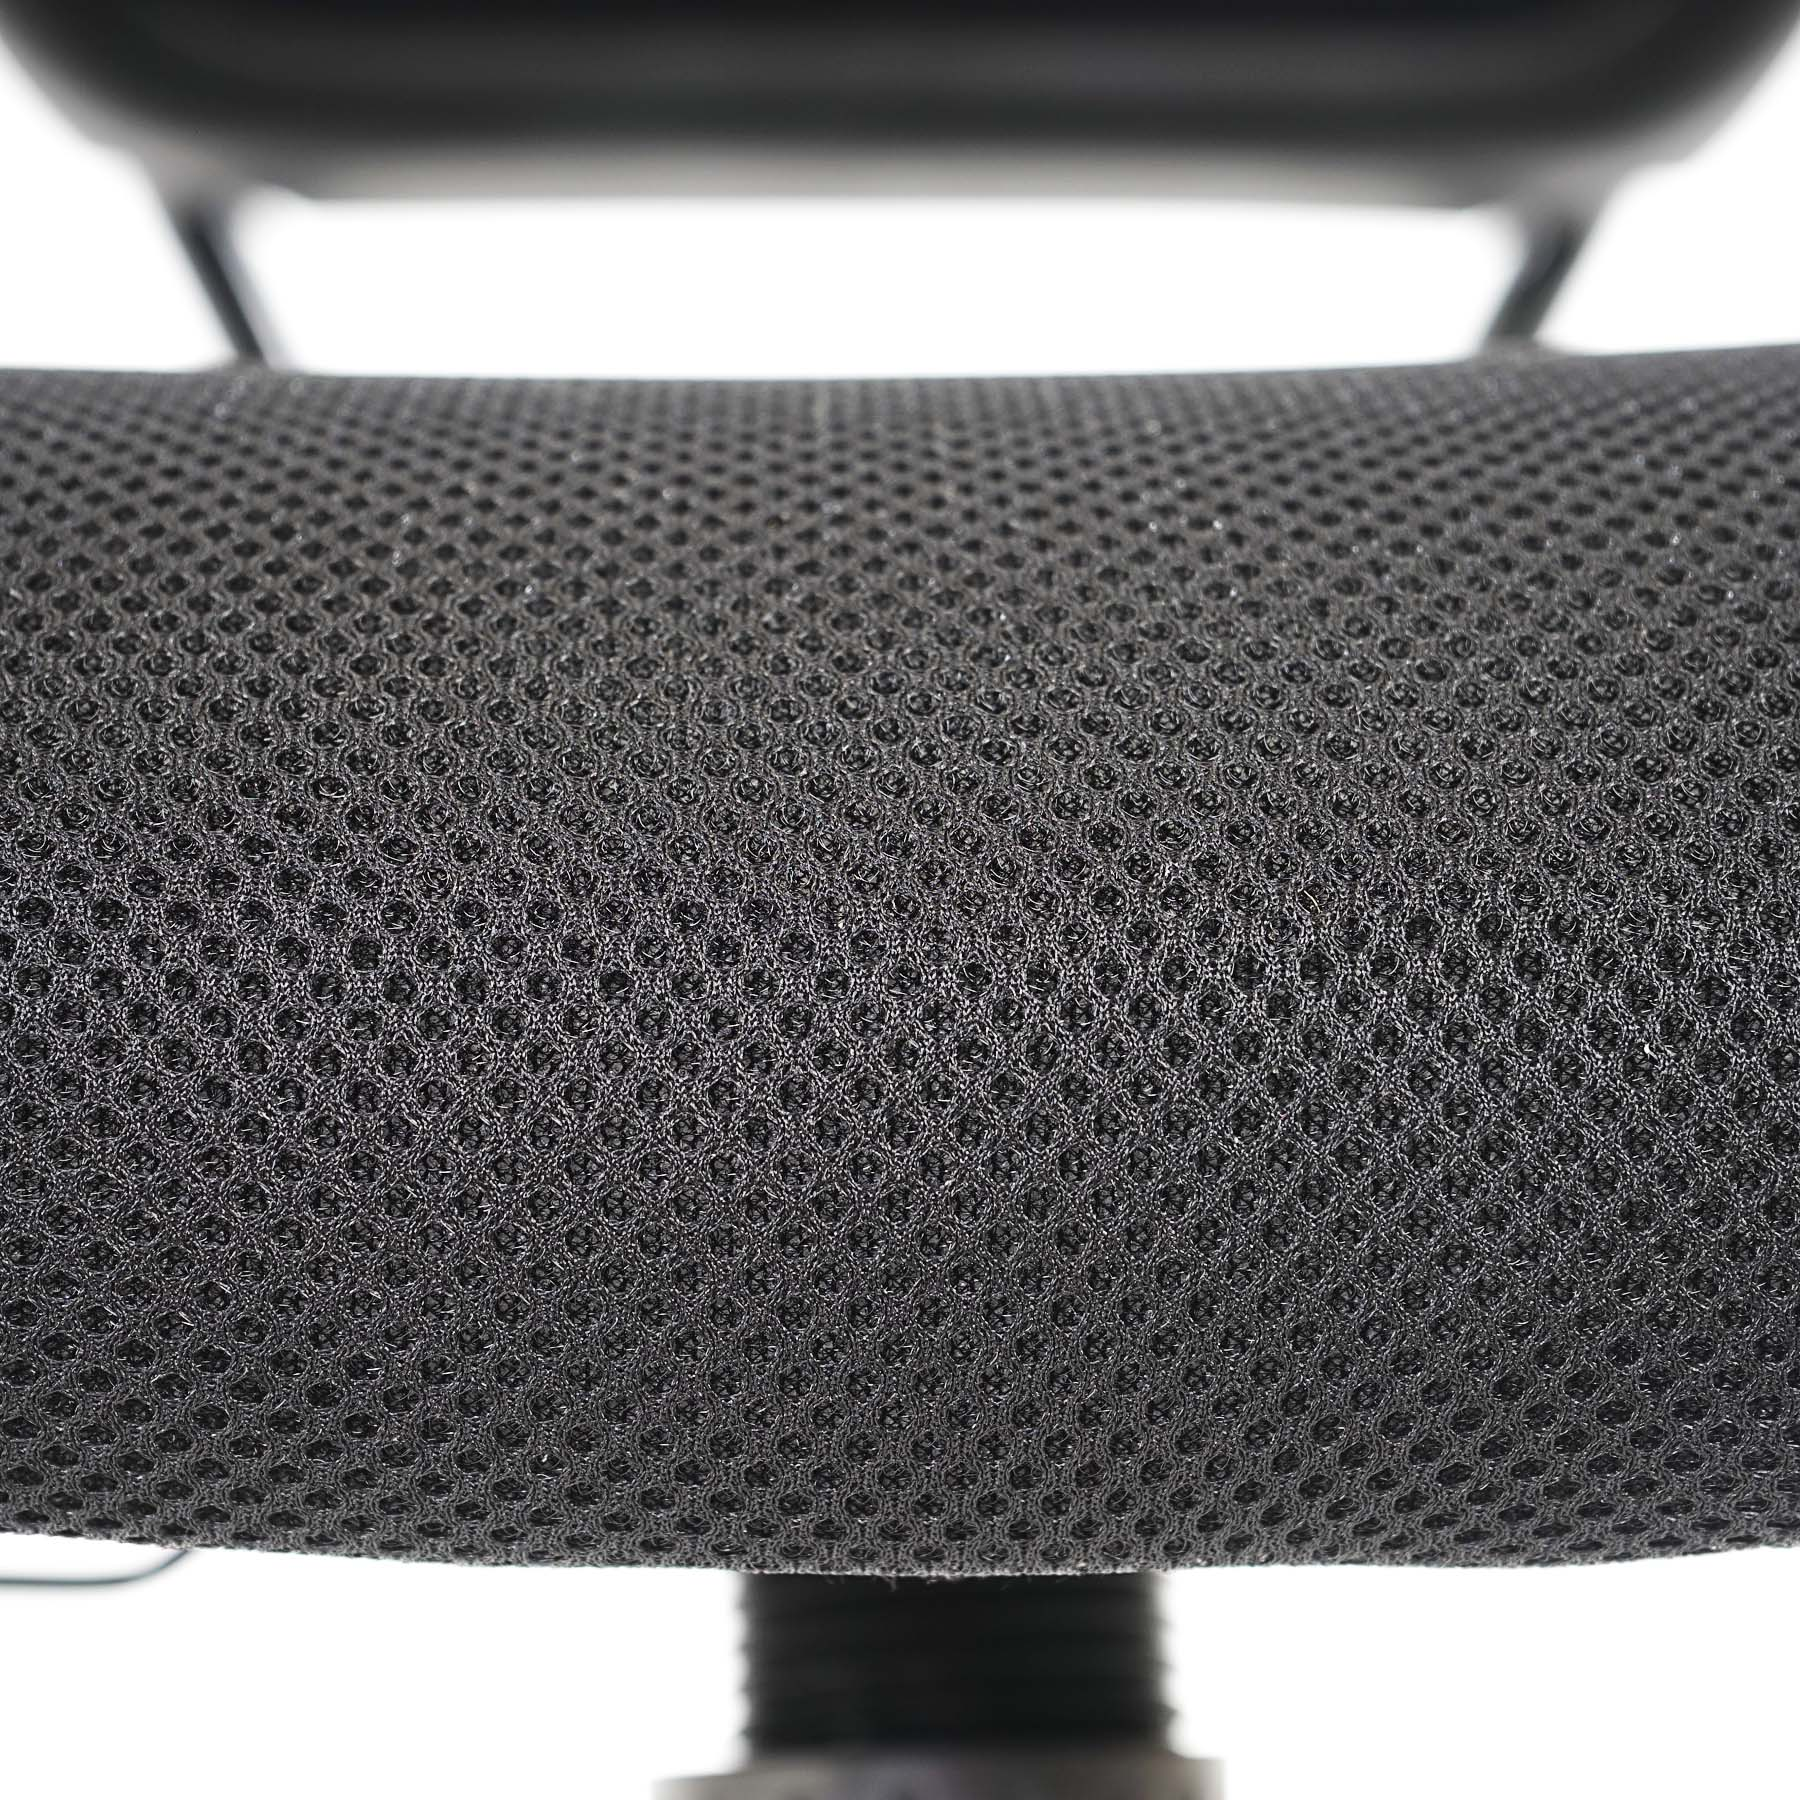 profi b rostuhl seattle chefsessel drehstuhl 150kg belastbar textil schwarz ohne armlehnen. Black Bedroom Furniture Sets. Home Design Ideas